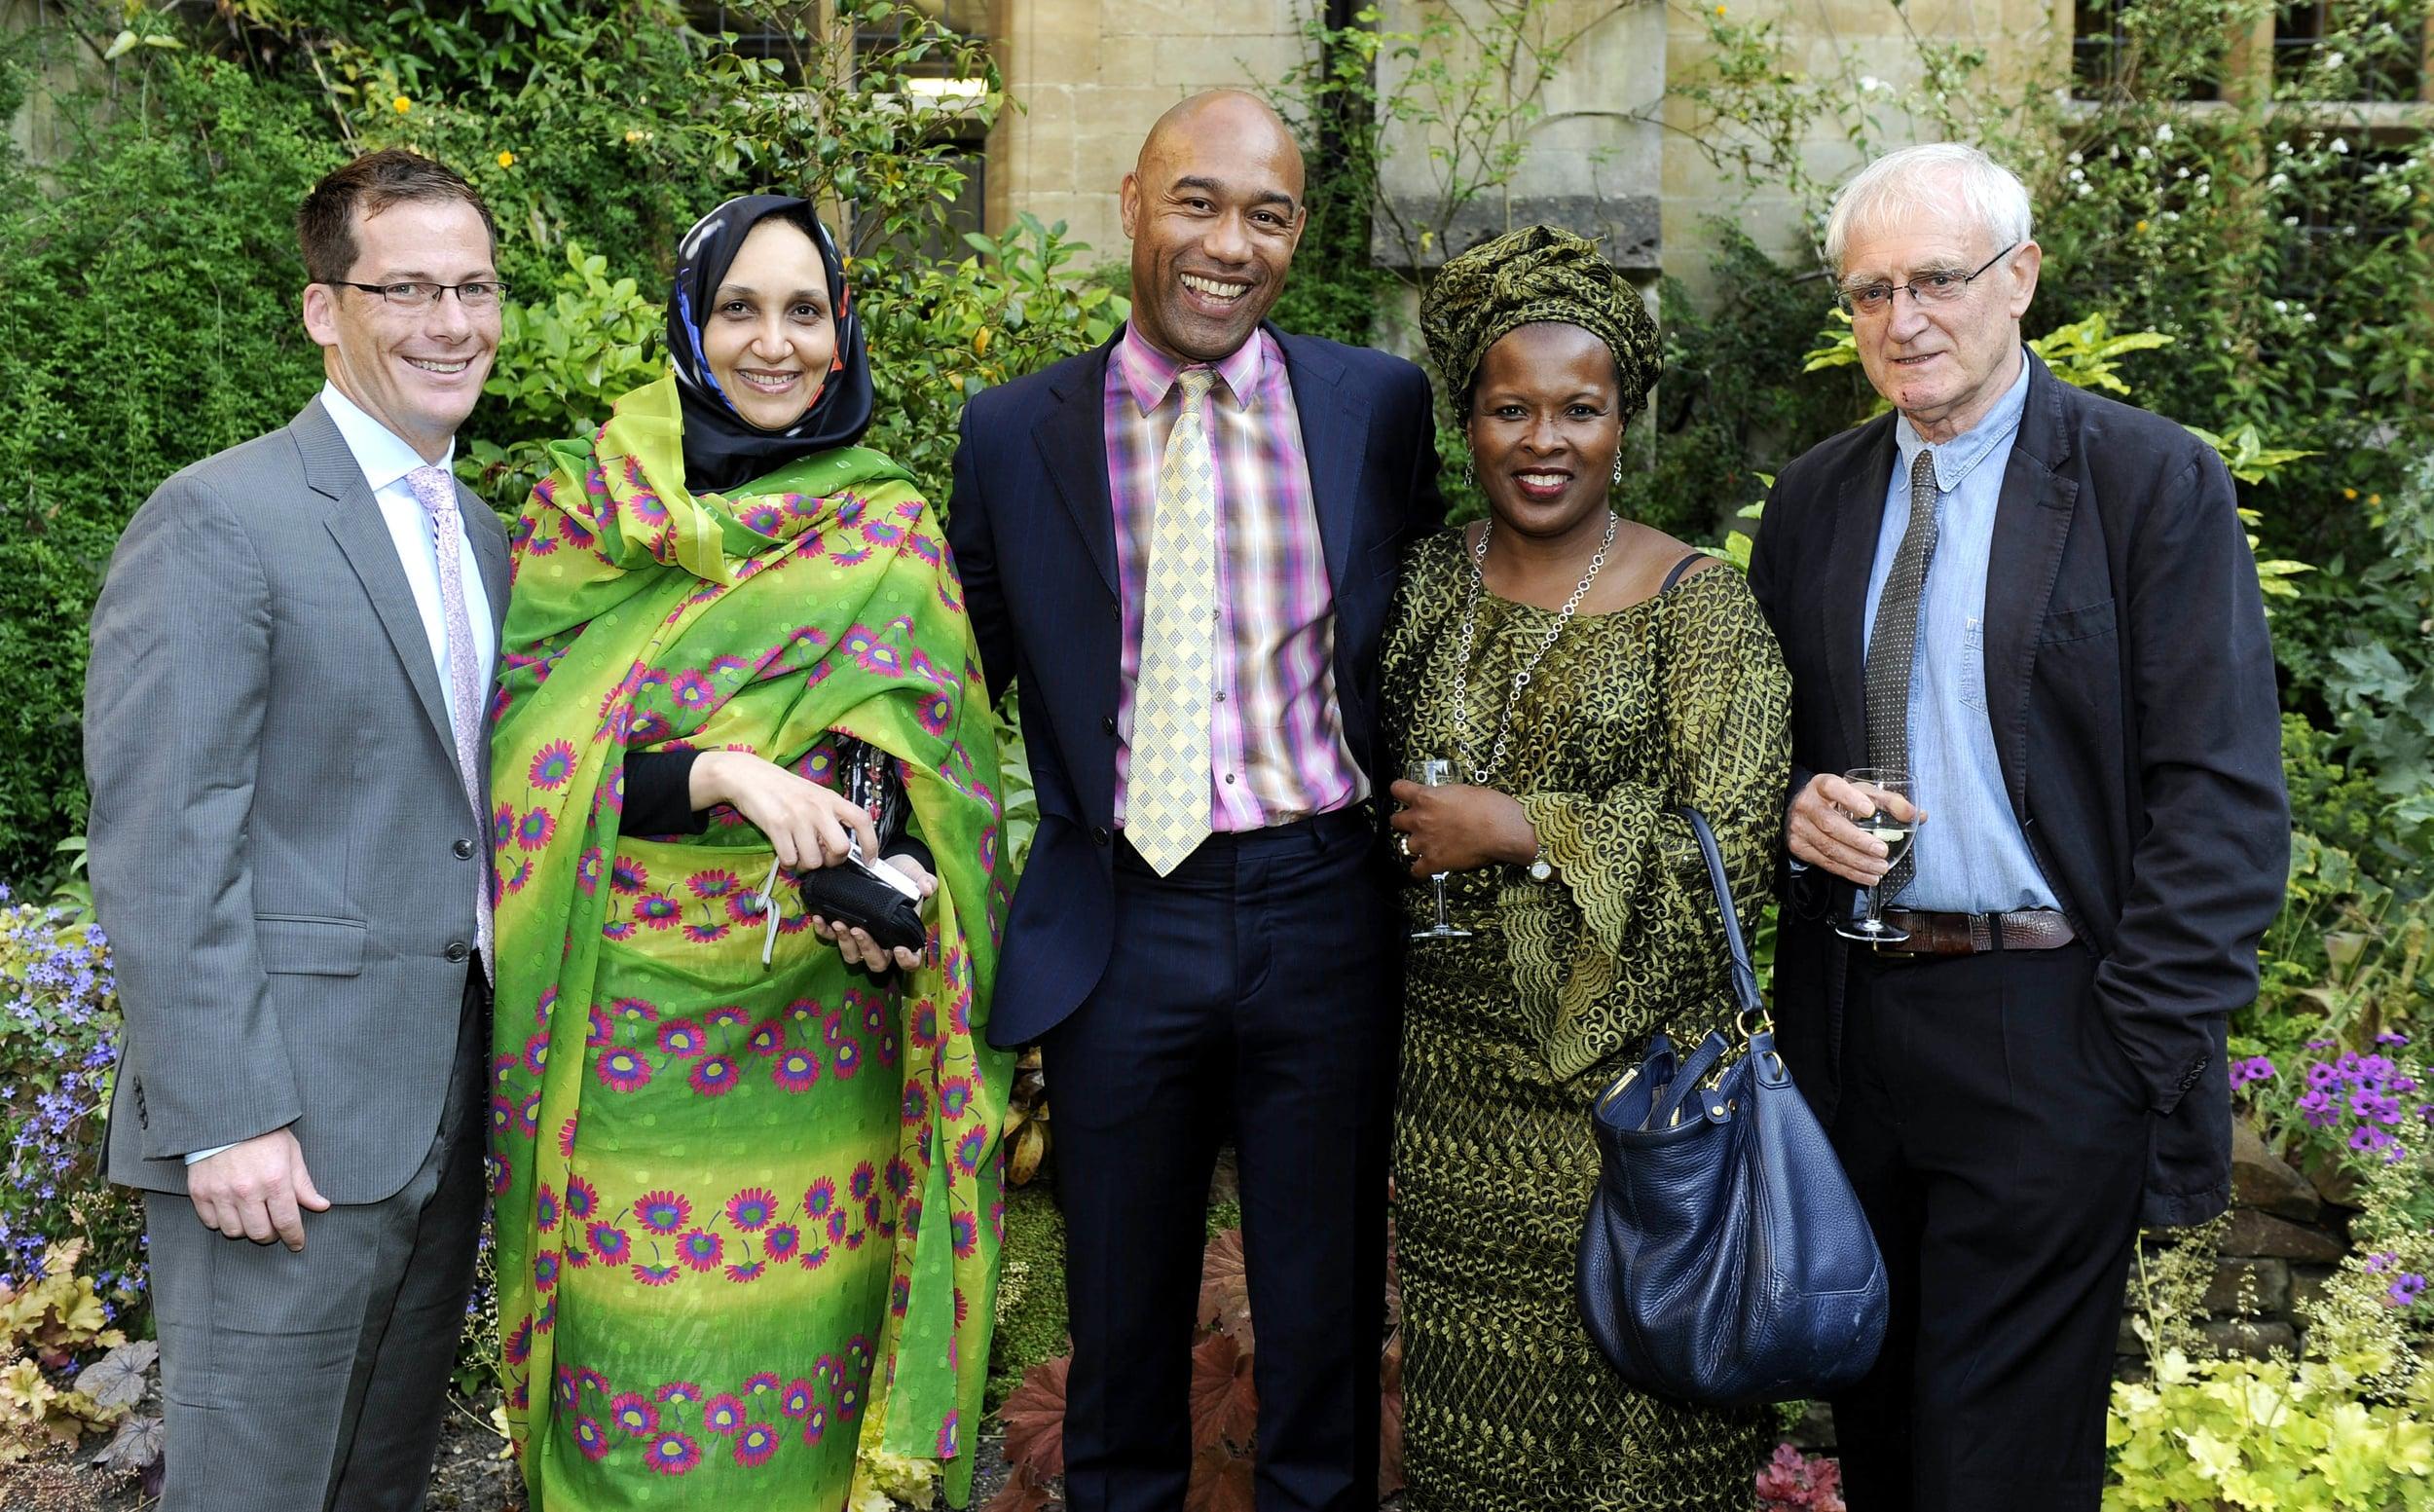 L to R: Nathan Hensley, Leila Aboulela, Gus Casely-Hayford, Sokari Douglas Camp, John Sutherland